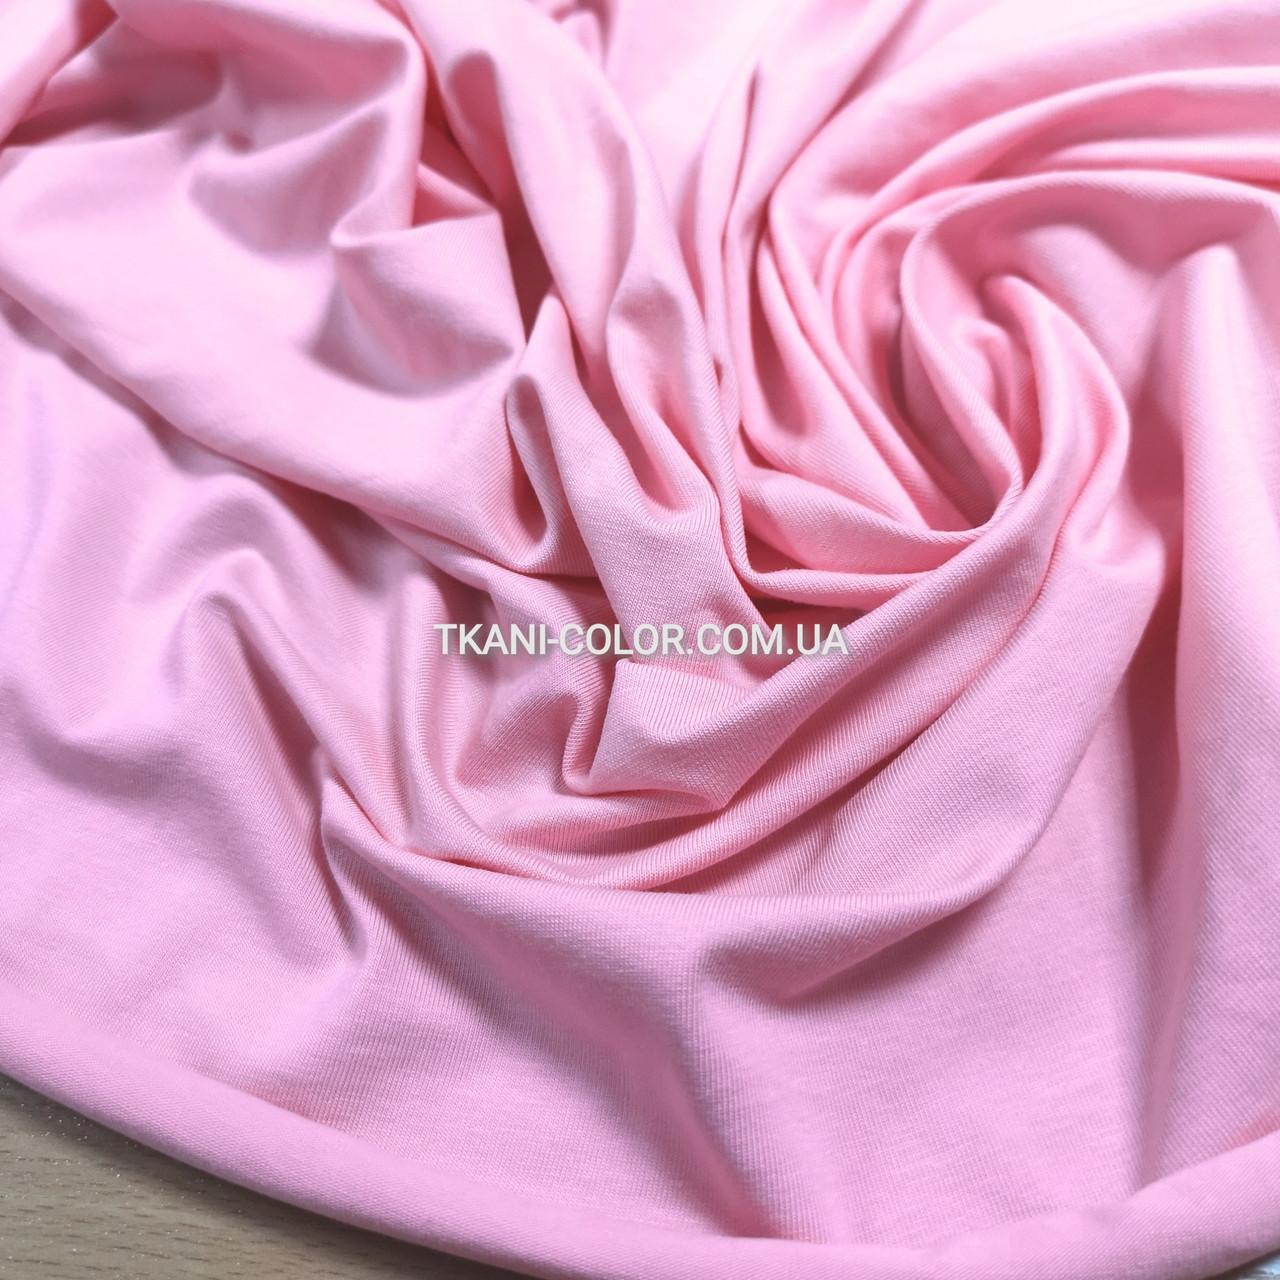 Ткань кулир стрейч розовый